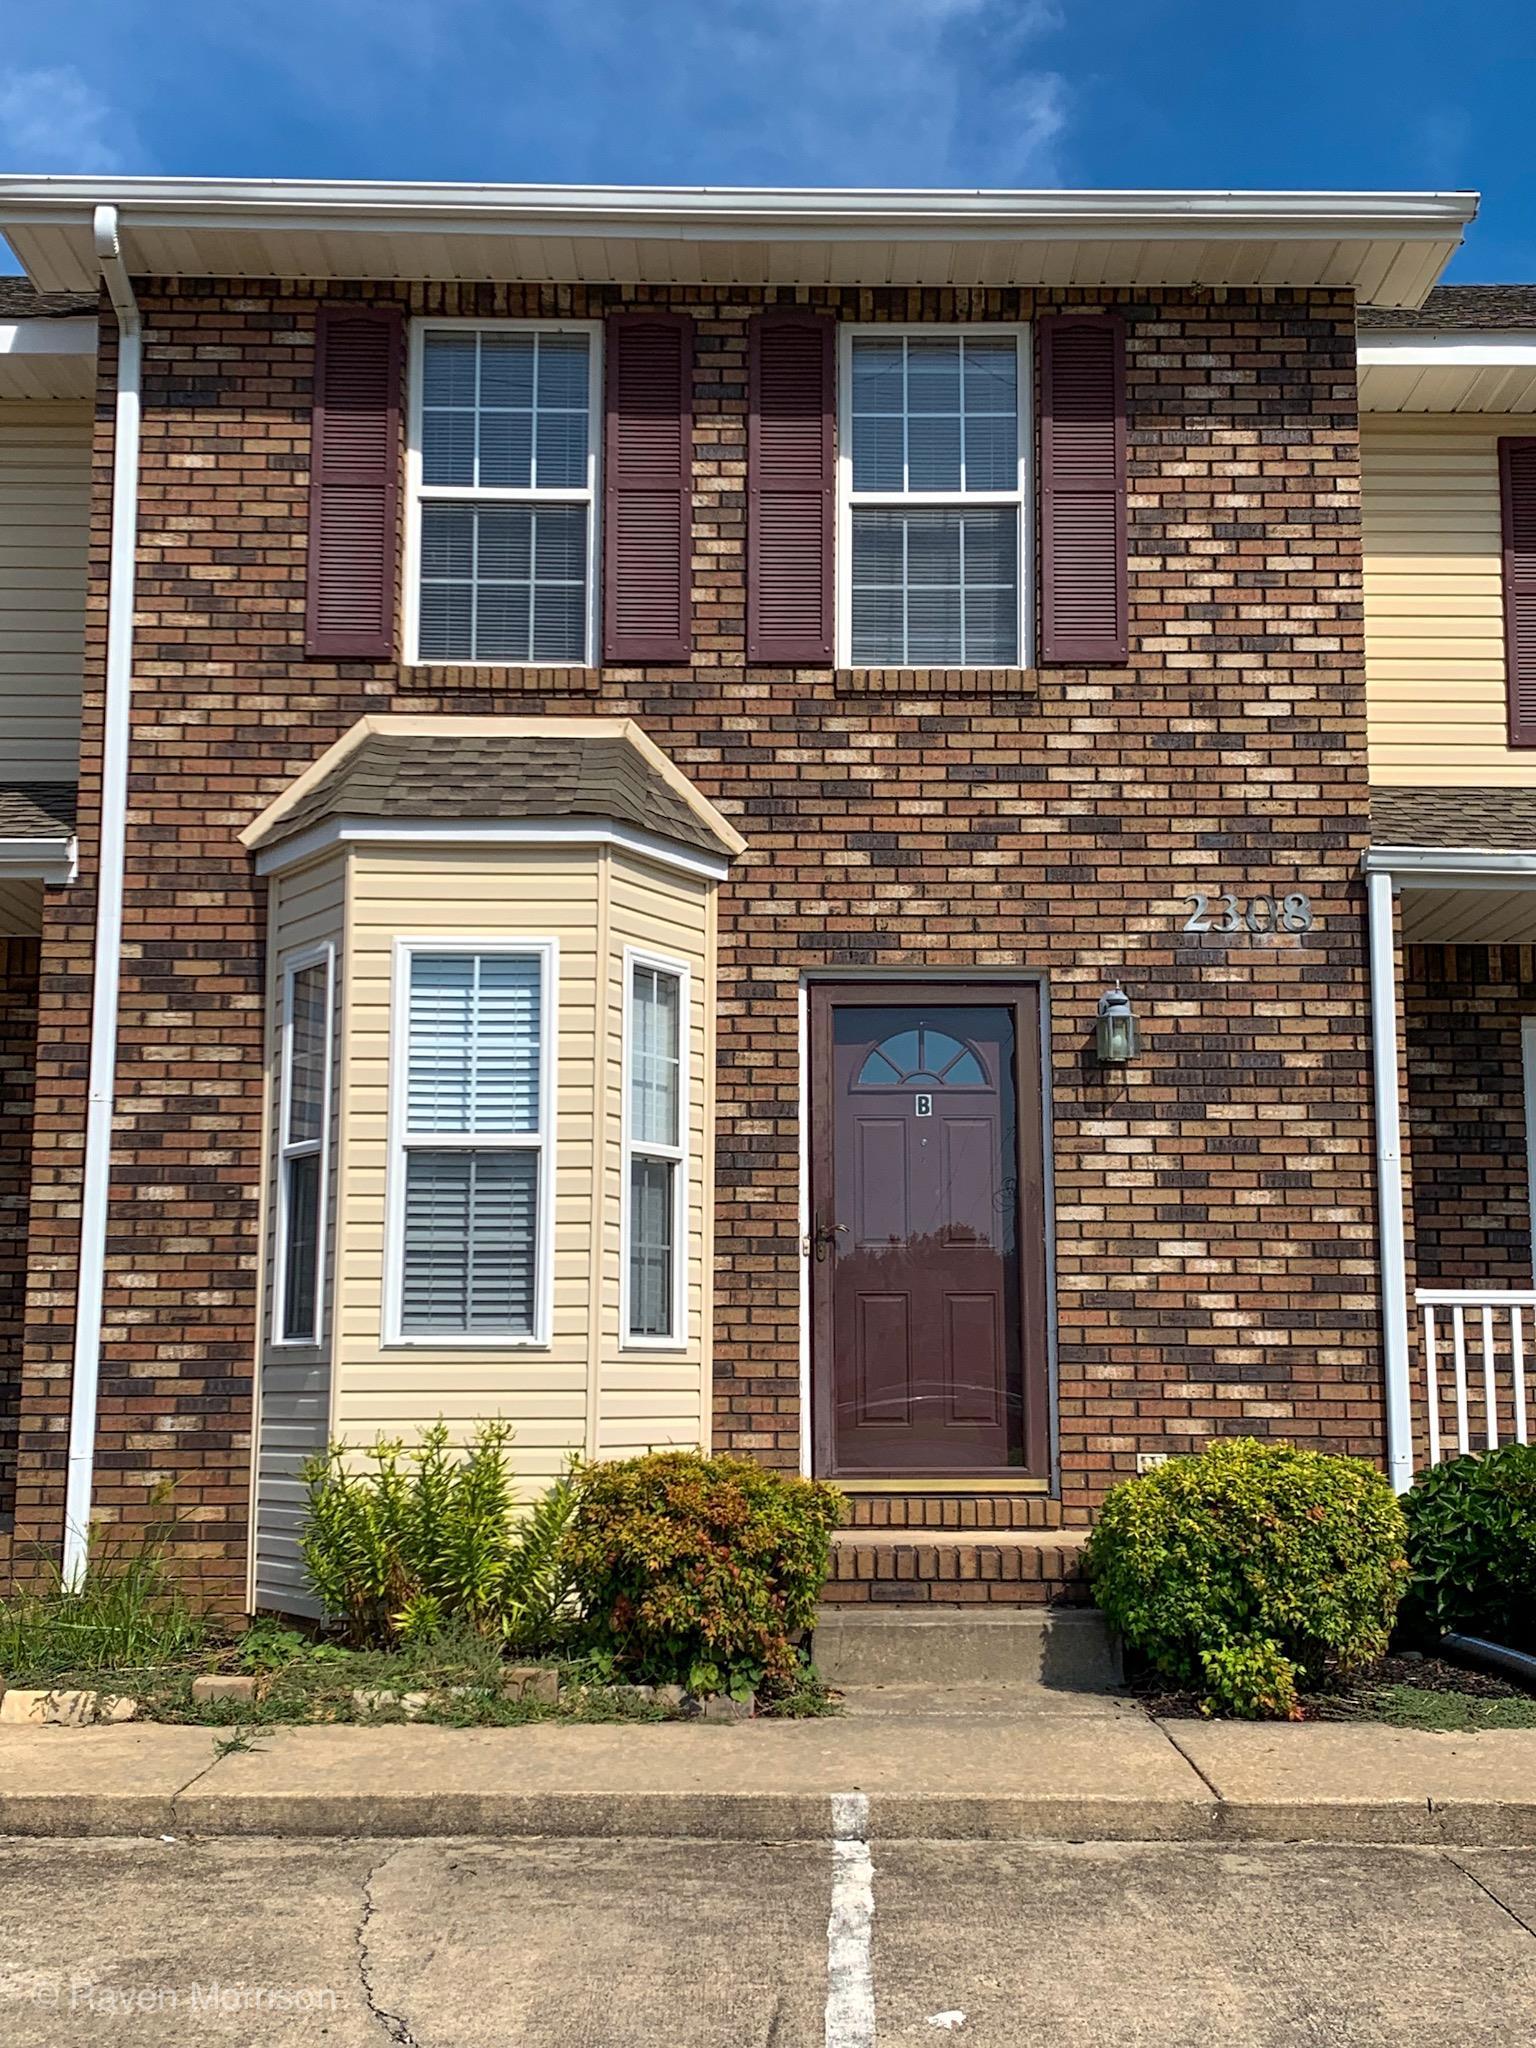 2308 Raleigh Ct Apt B, Clarksville, TN 37043 - Clarksville, TN real estate listing